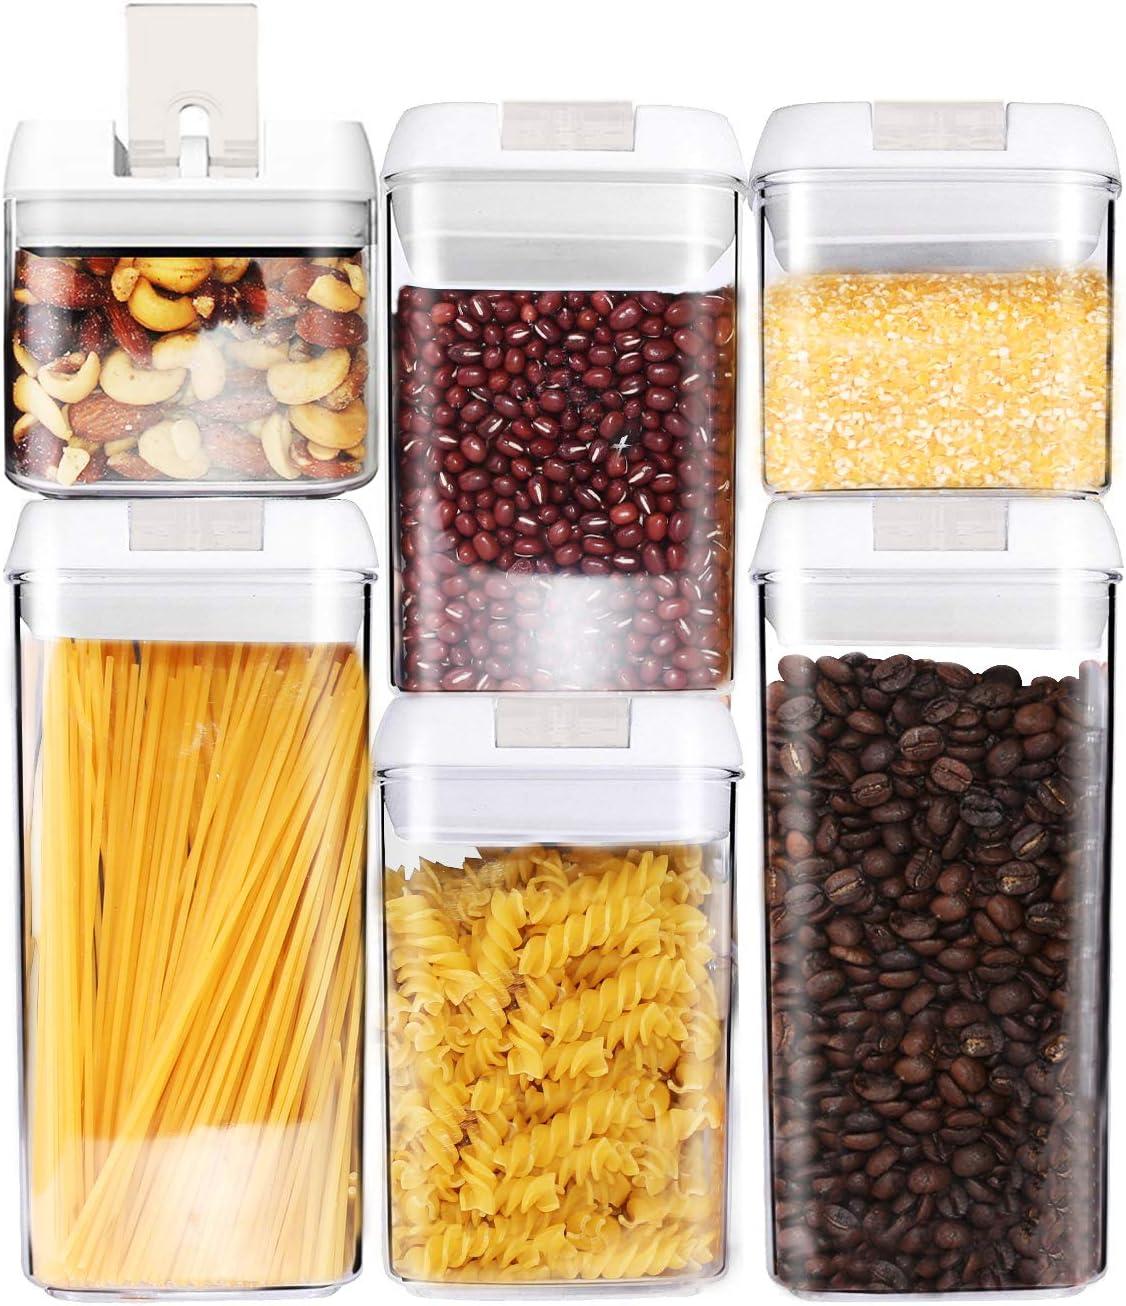 Amazon Com Dragonn 6 Piece Airtight Food Storage Container Set Keeps Food Fresh Dry Durable Plastic Bpa Free 6 Piece Set Dn Kw Fs06 Home Improvement